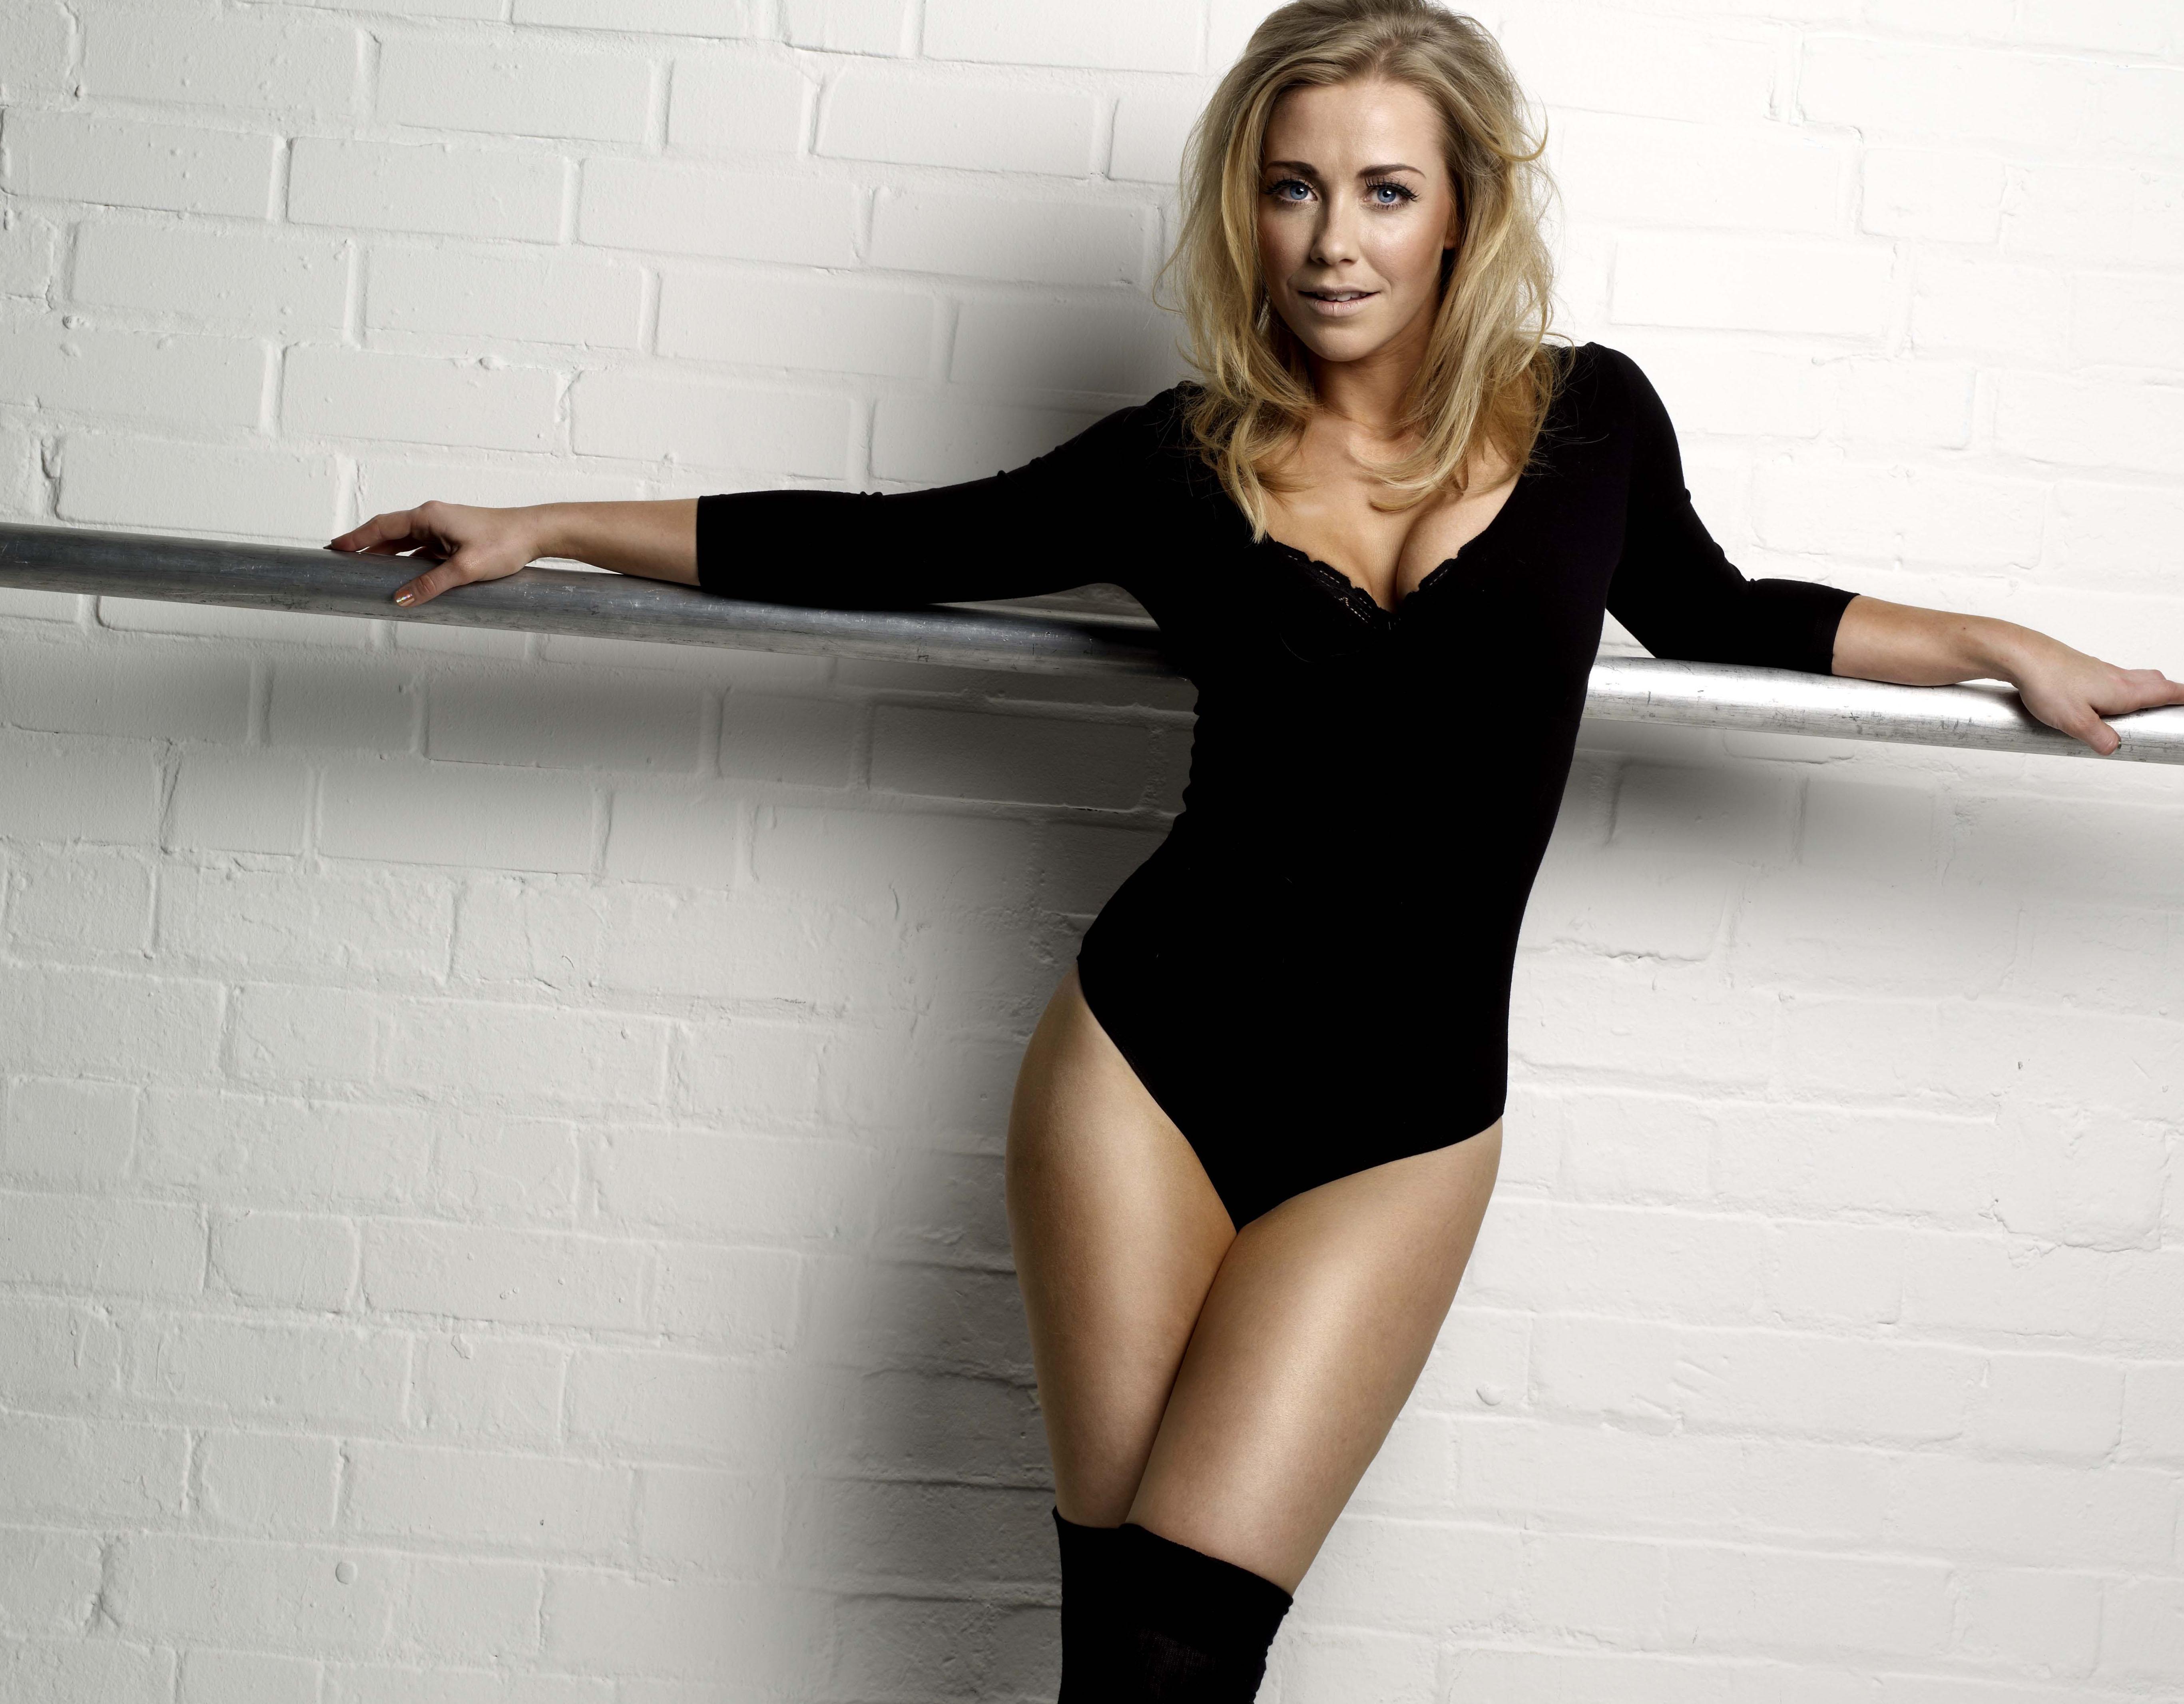 Emma Watson Hypnotized Sex Slave | Free Download Nude